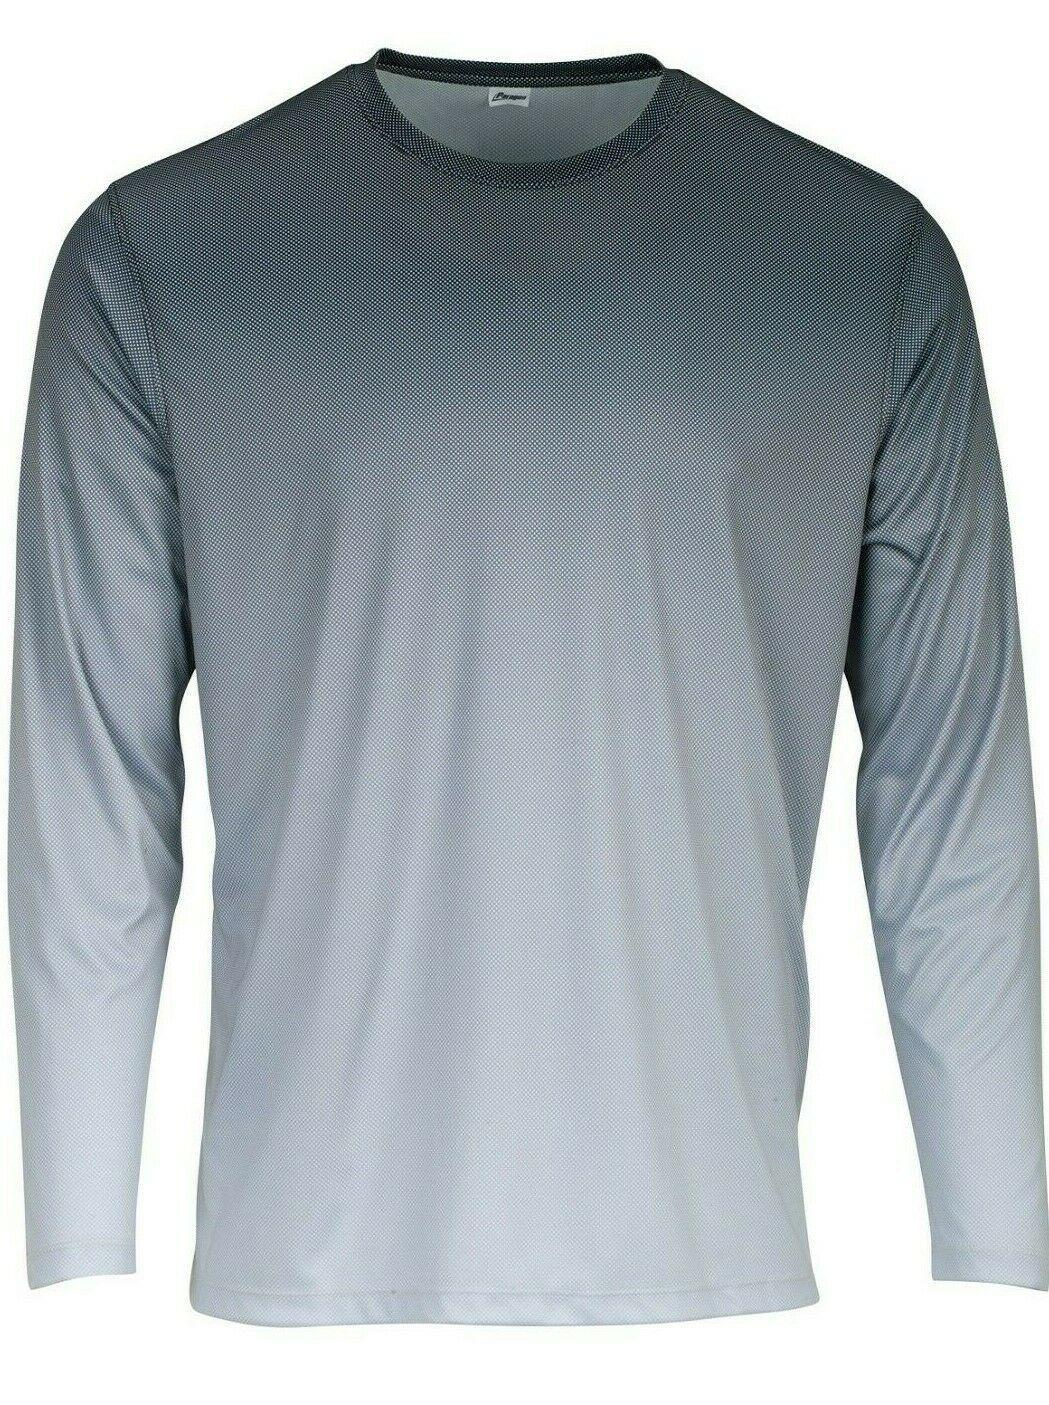 Sun Protection Long Sleeve Dri Fit Black Light Gray base layer sun shirt UPF 50+